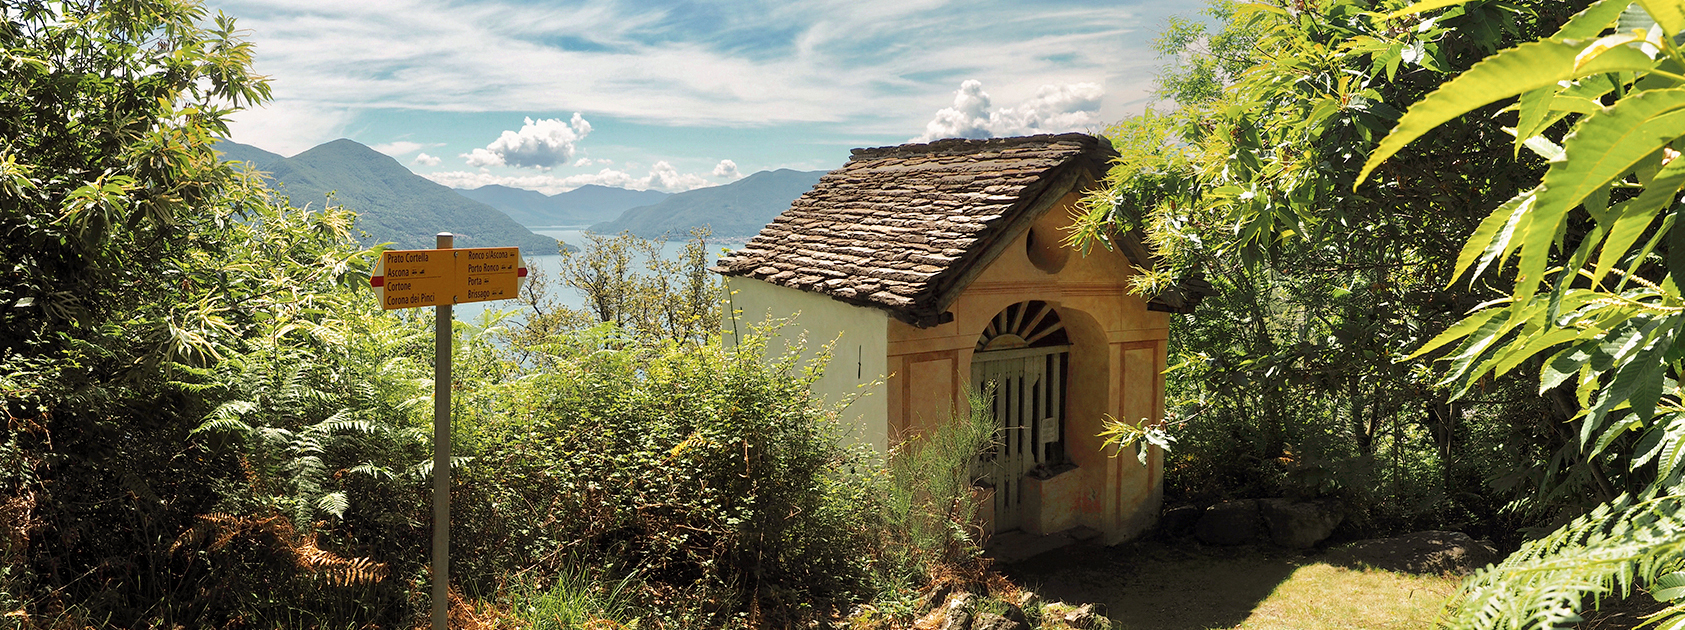 Cappelle Votive comune Ronco Sopra Ascona